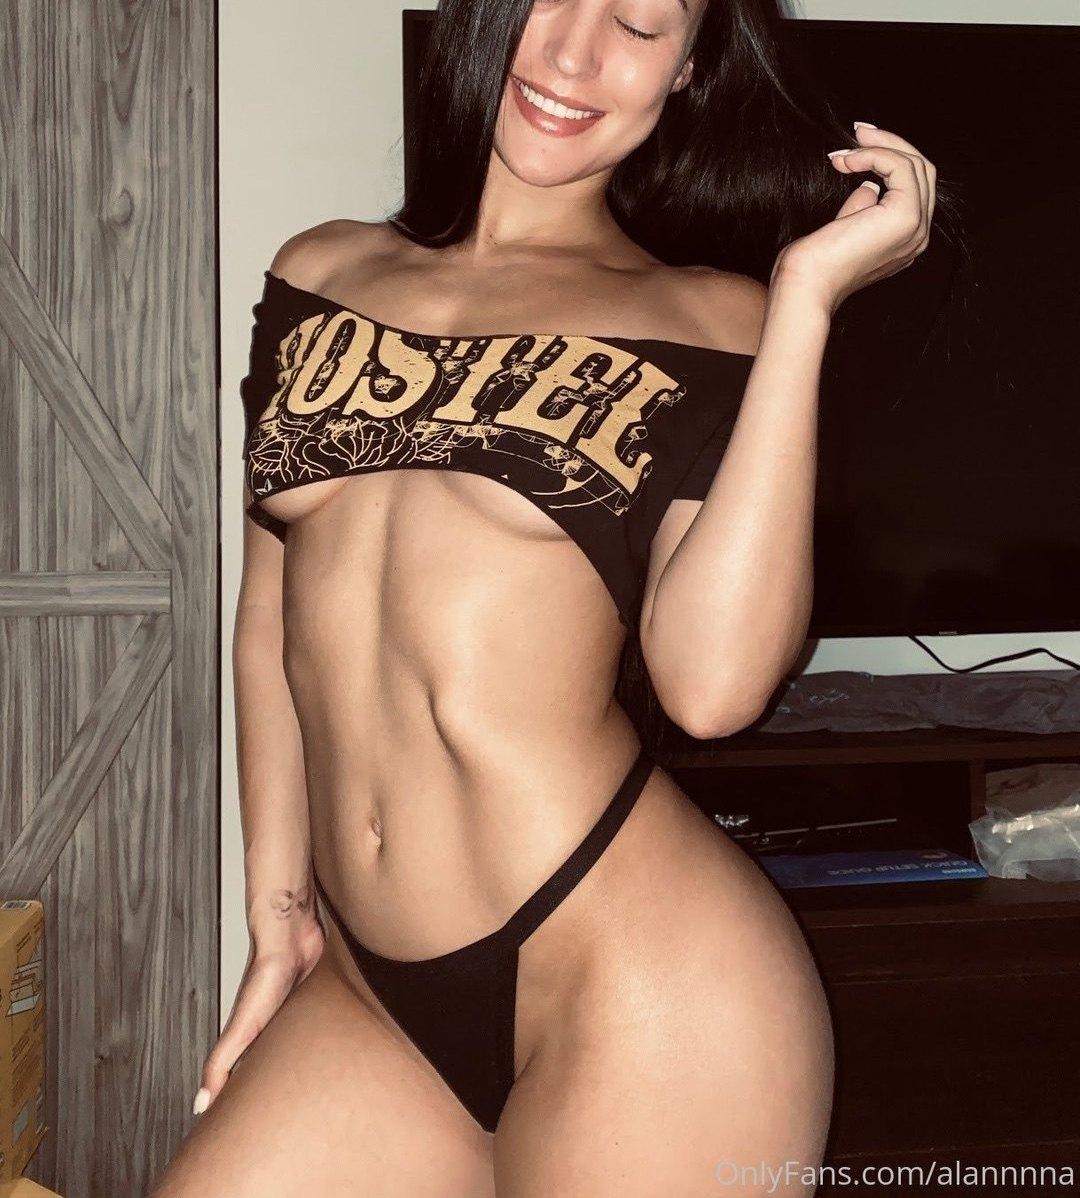 Alanna Dergan Alannnna Onlyfans Nudes Leaks 0007